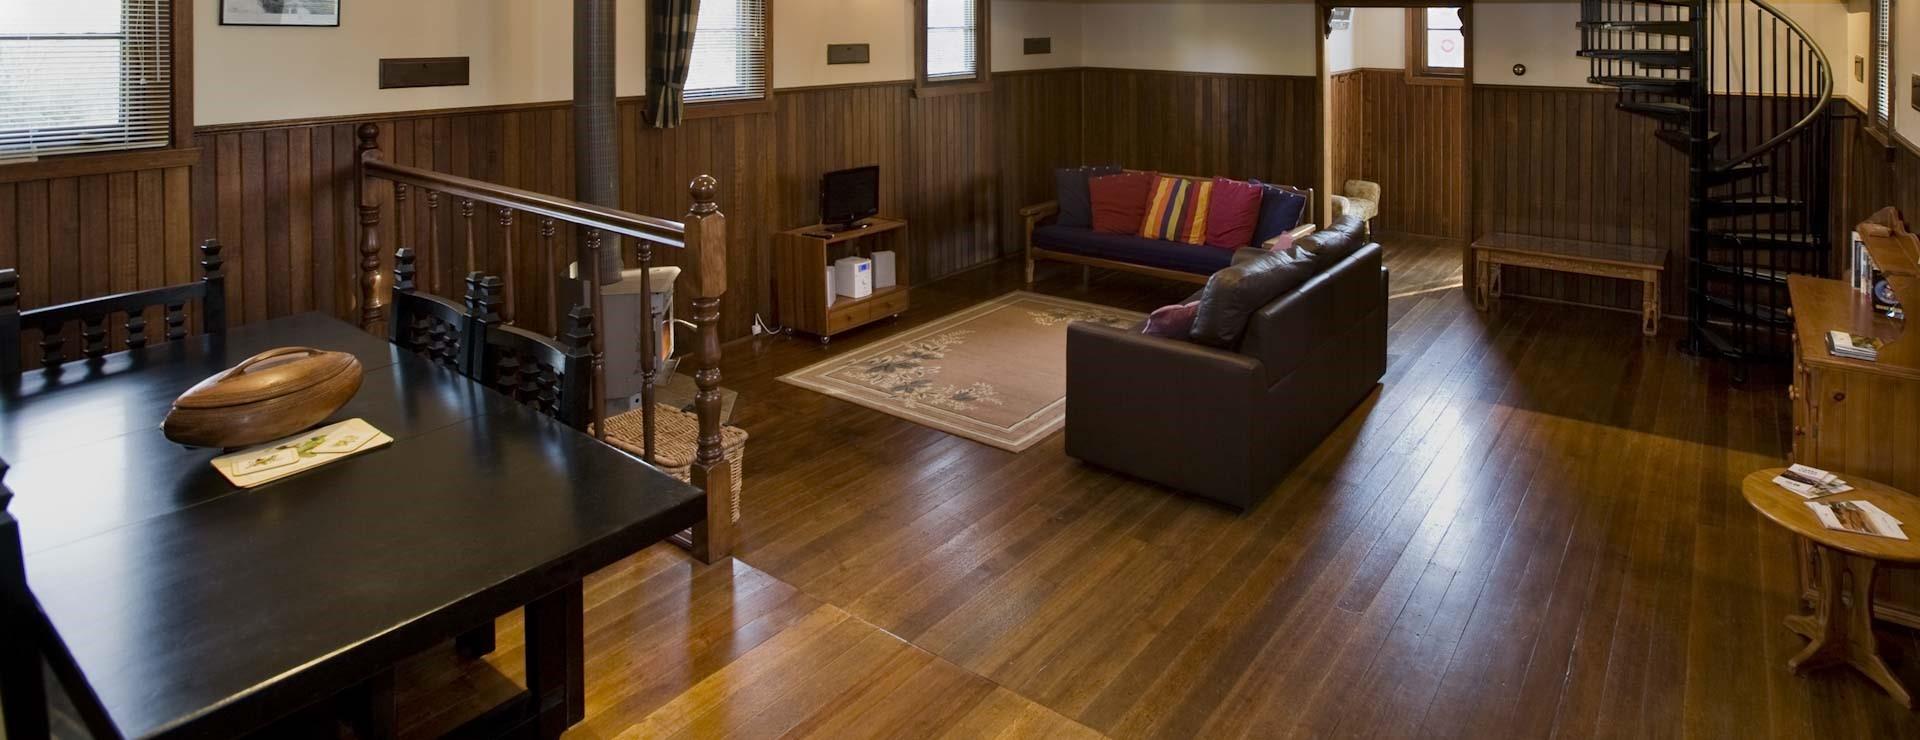 Interior Deck and Floor Restoration